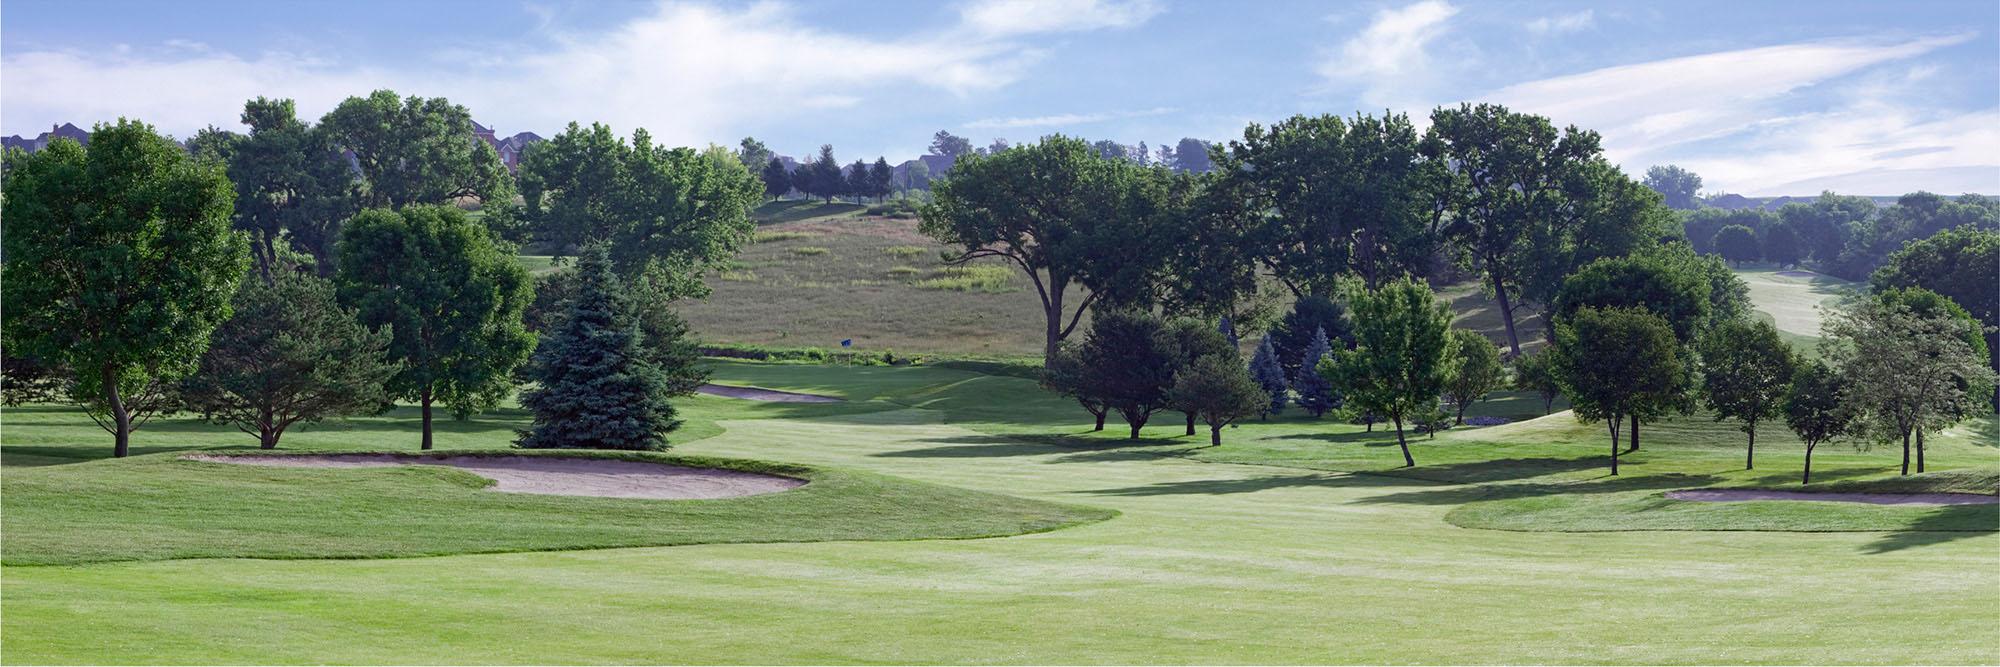 Golf Course Image - Indian Creek Black Bird No. 1